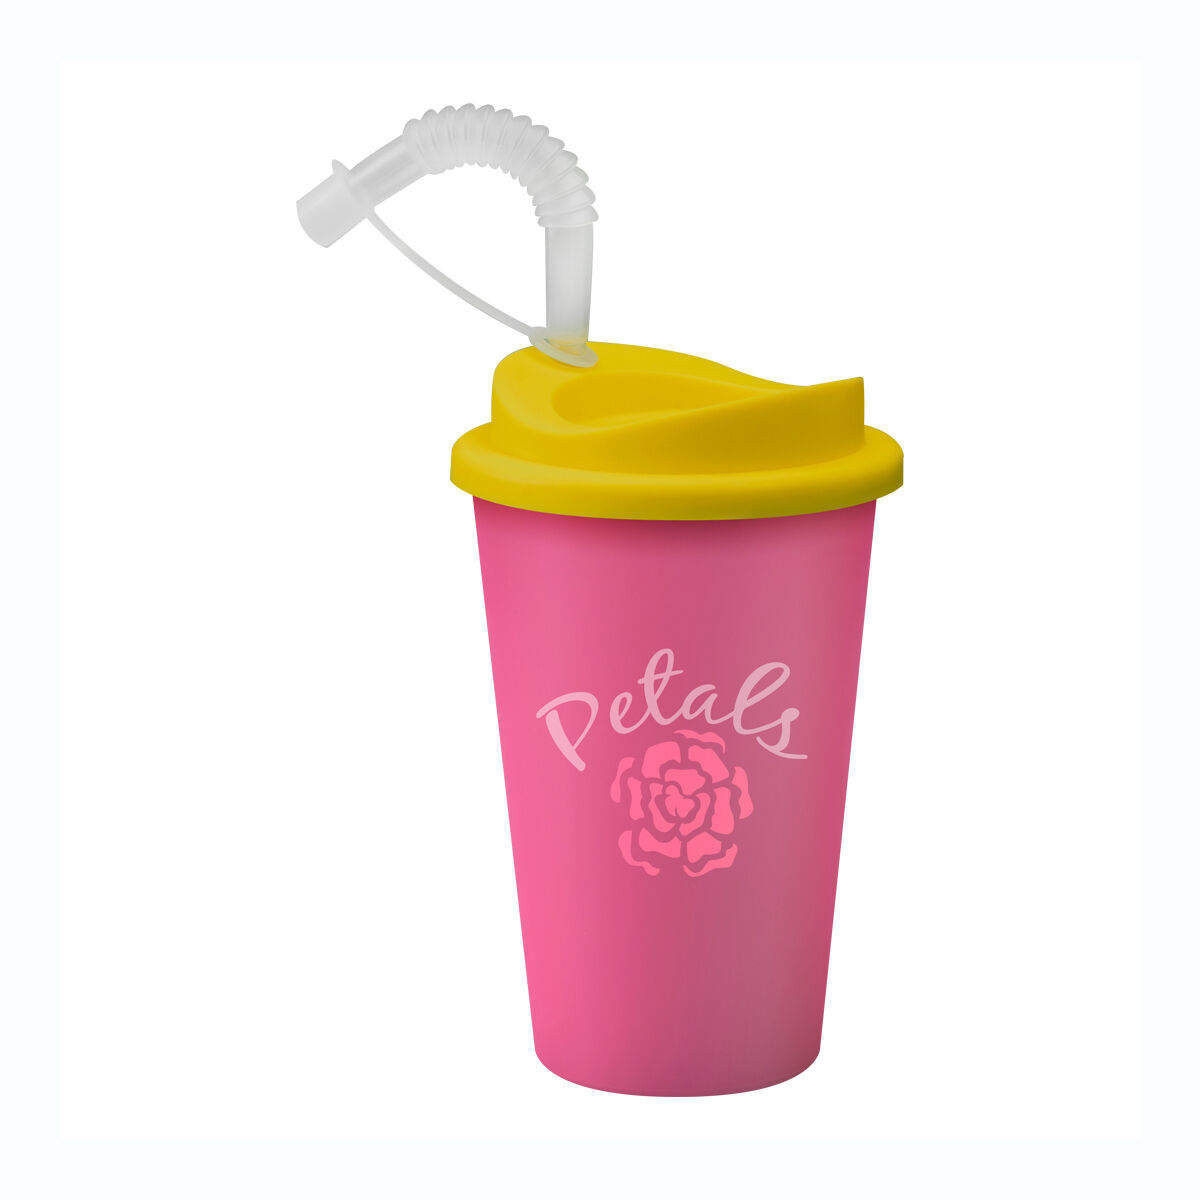 Universal Travel Mug with Straw